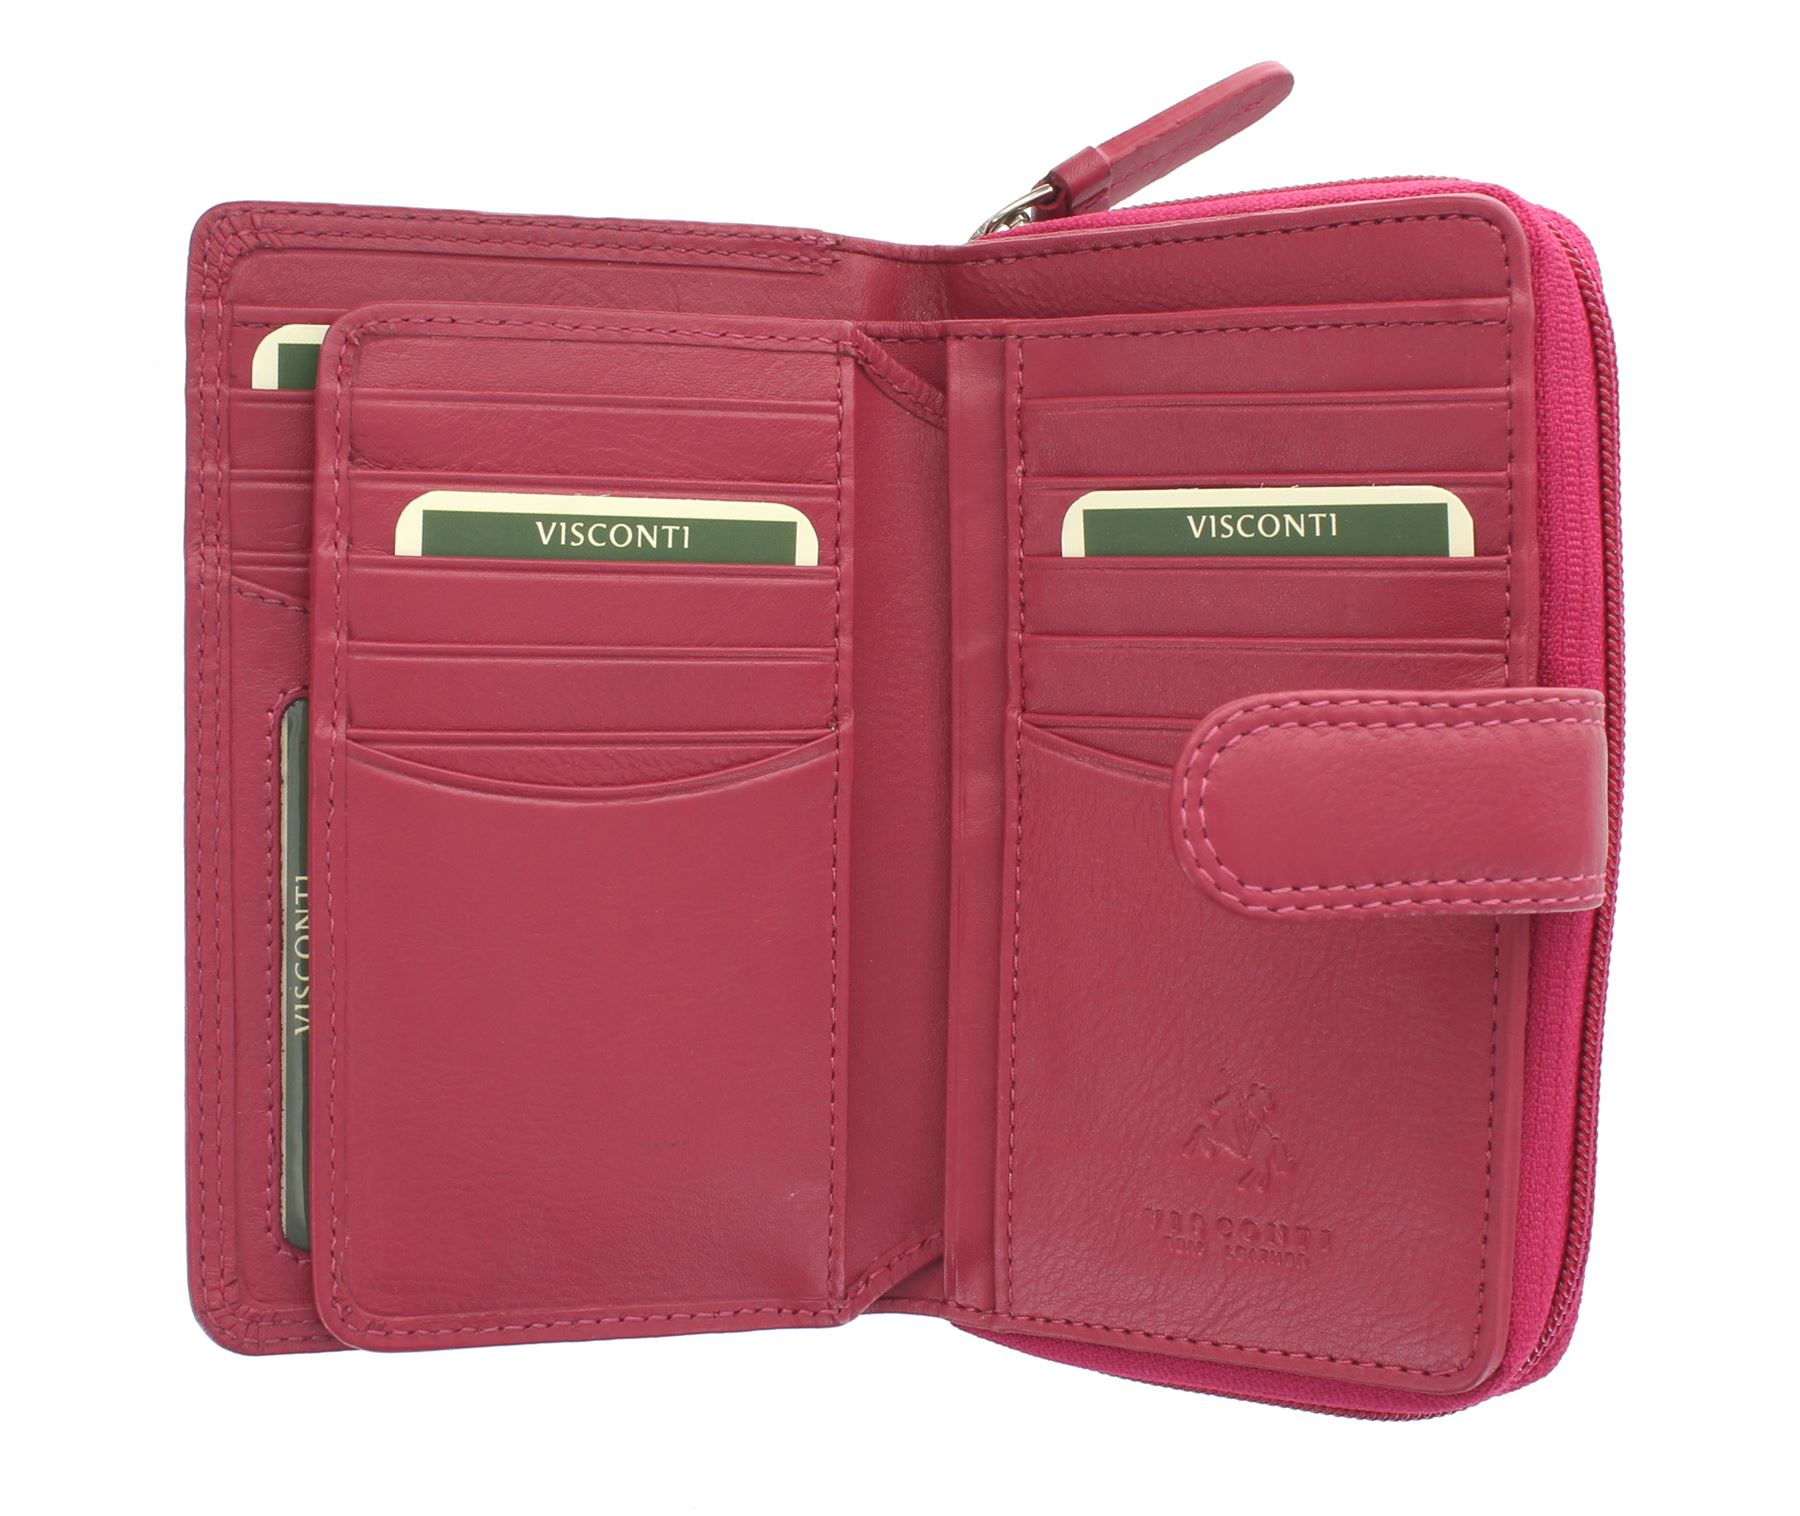 Visconti-Heritage-Collection-MADAME-Leather-Purse-Tab-Closure-RFID-blocking-HT33 miniatura 14